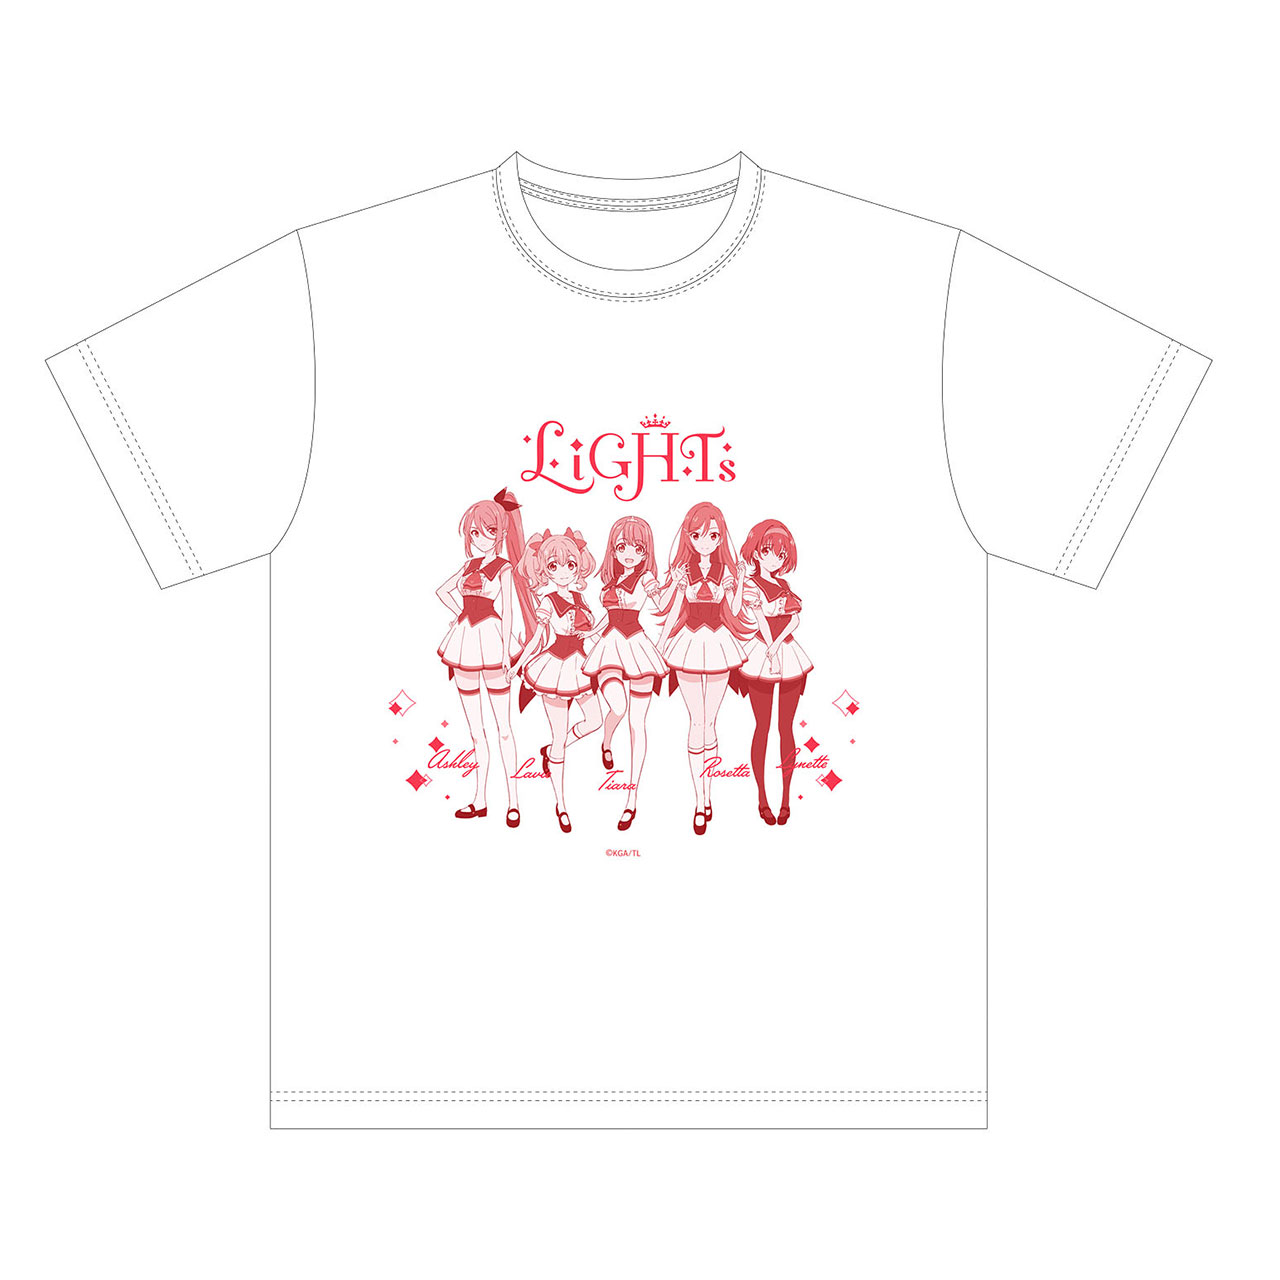 LiGHTs Tシャツ 白